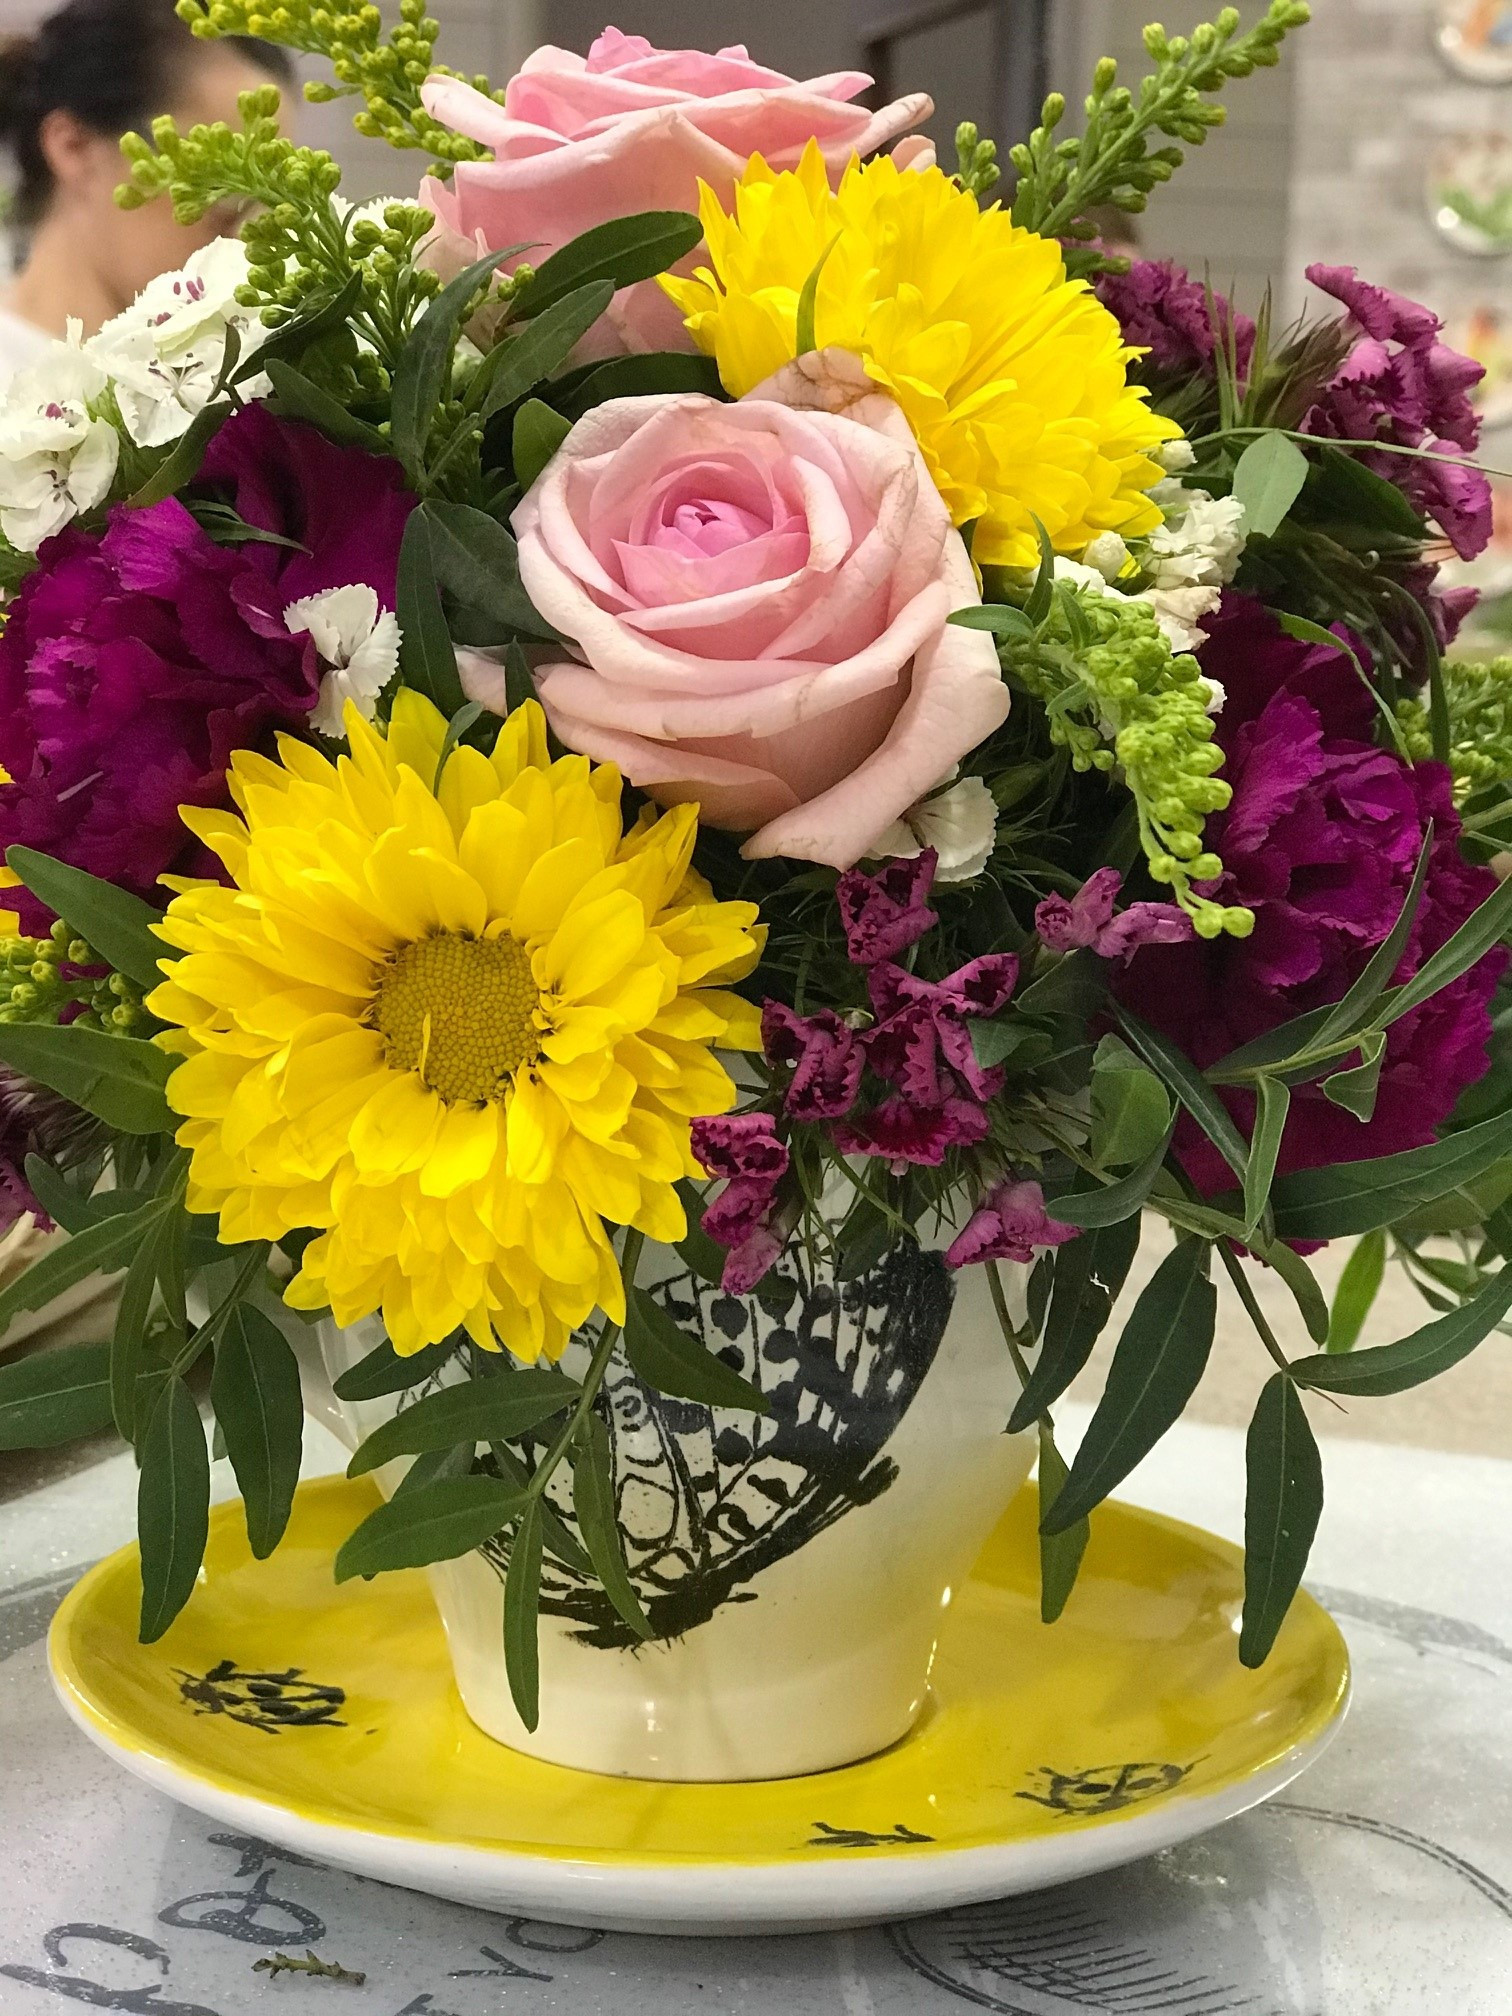 Workshop: teacup and flowers 21/9 & 28/9